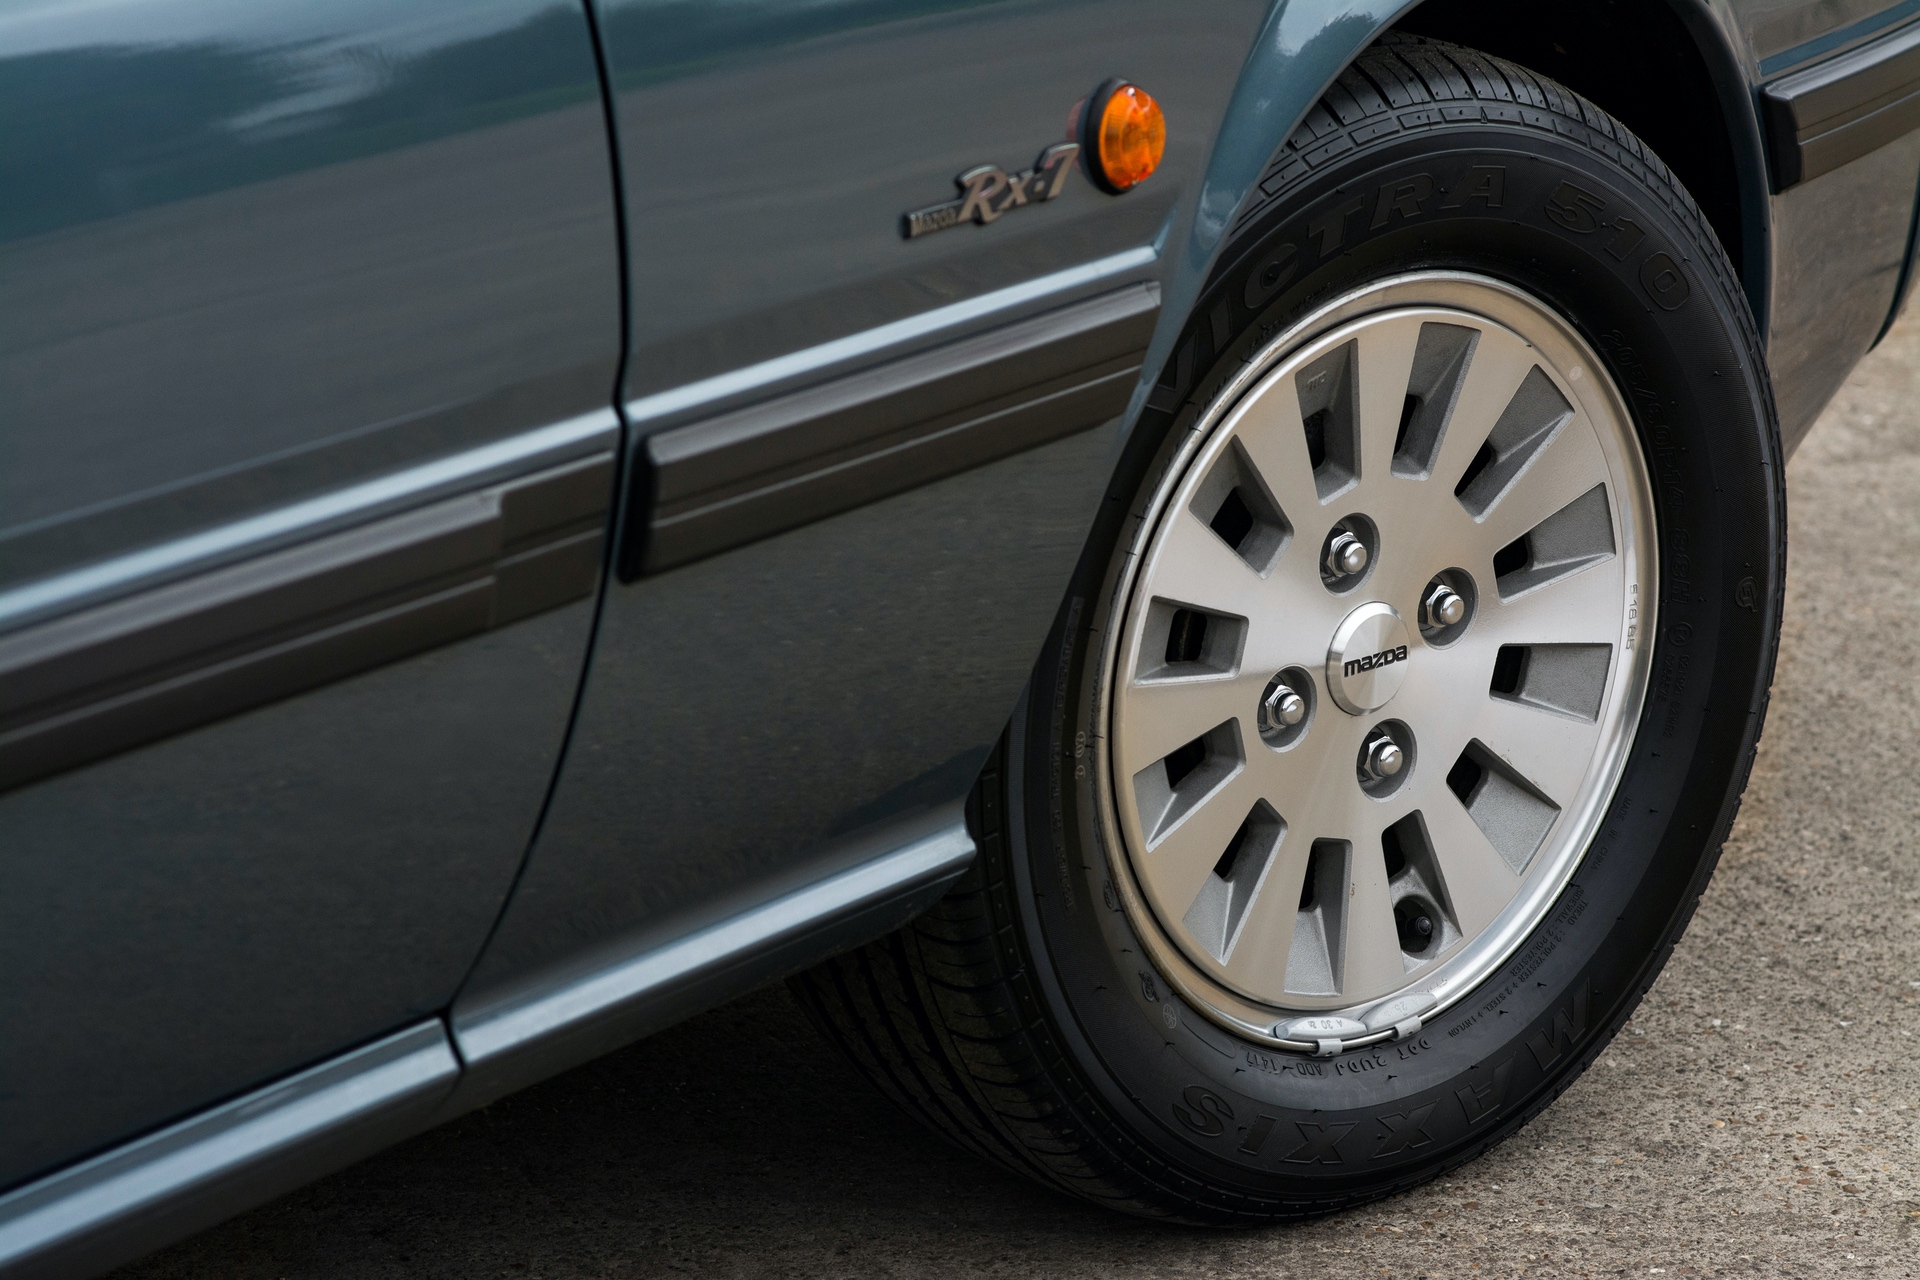 Mazda_RX-7_history_0040